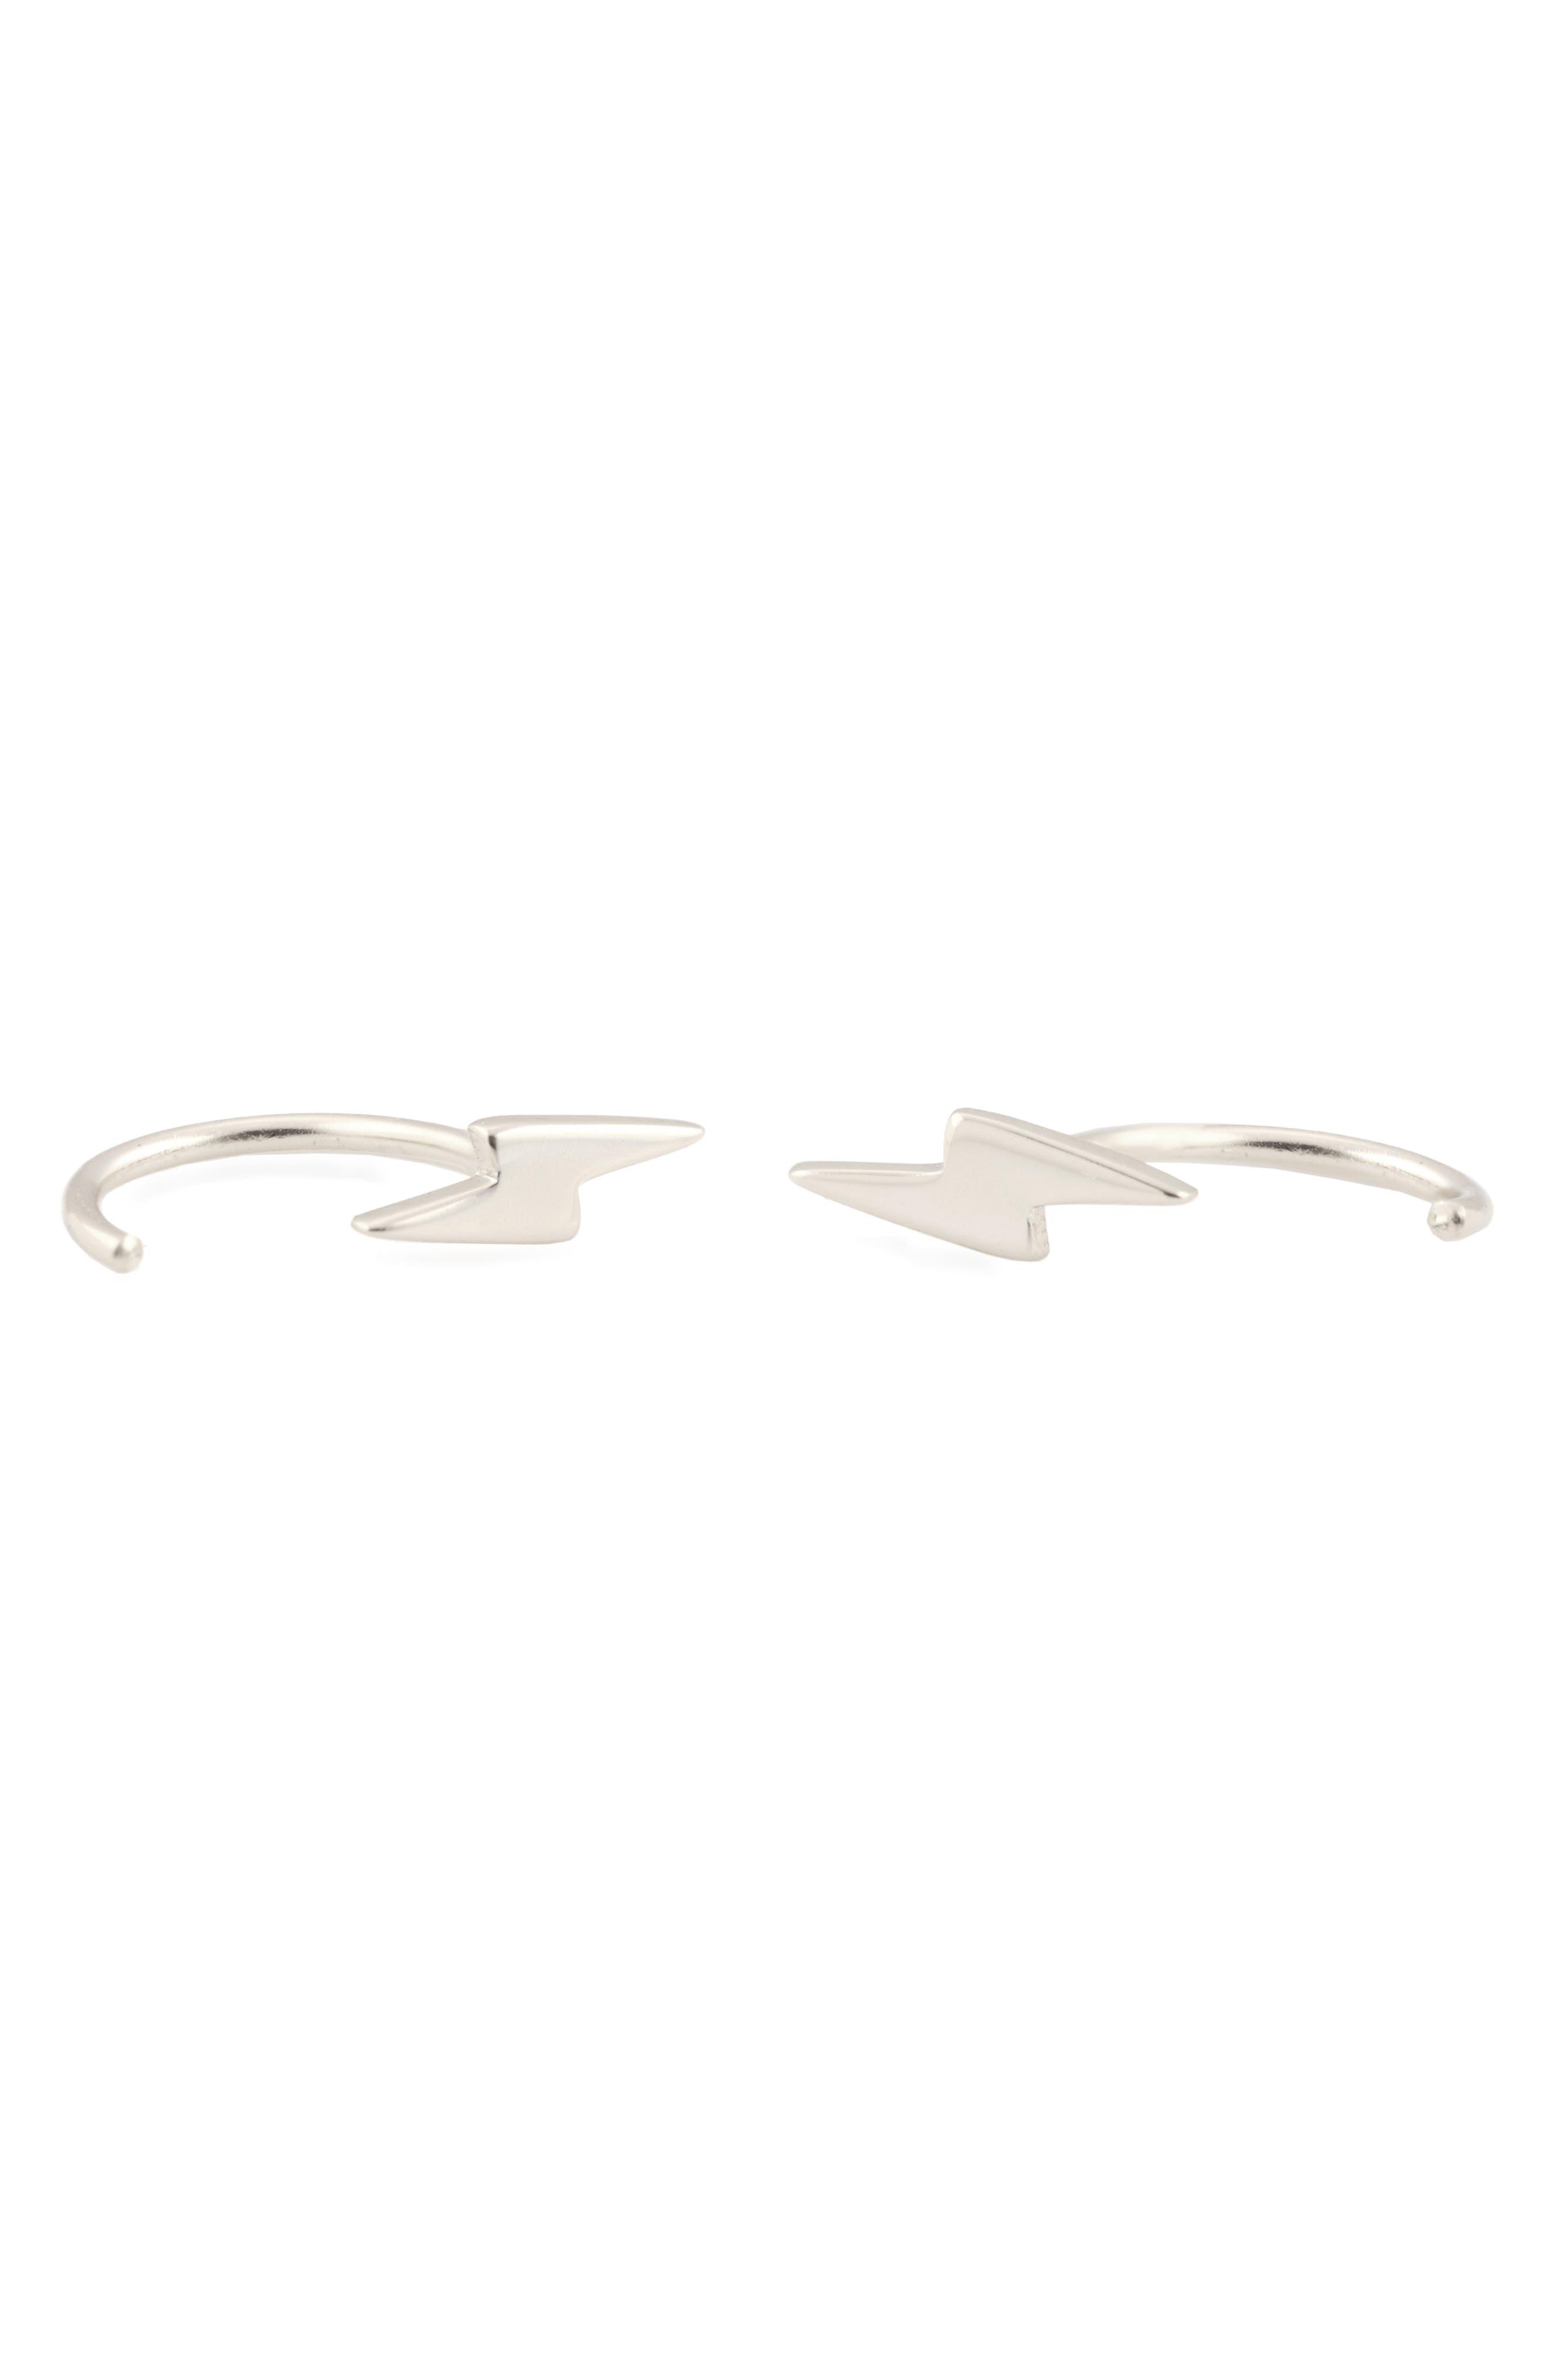 Tiny Lightning Stud Hoop Earrings,                             Main thumbnail 1, color,                             SILVER